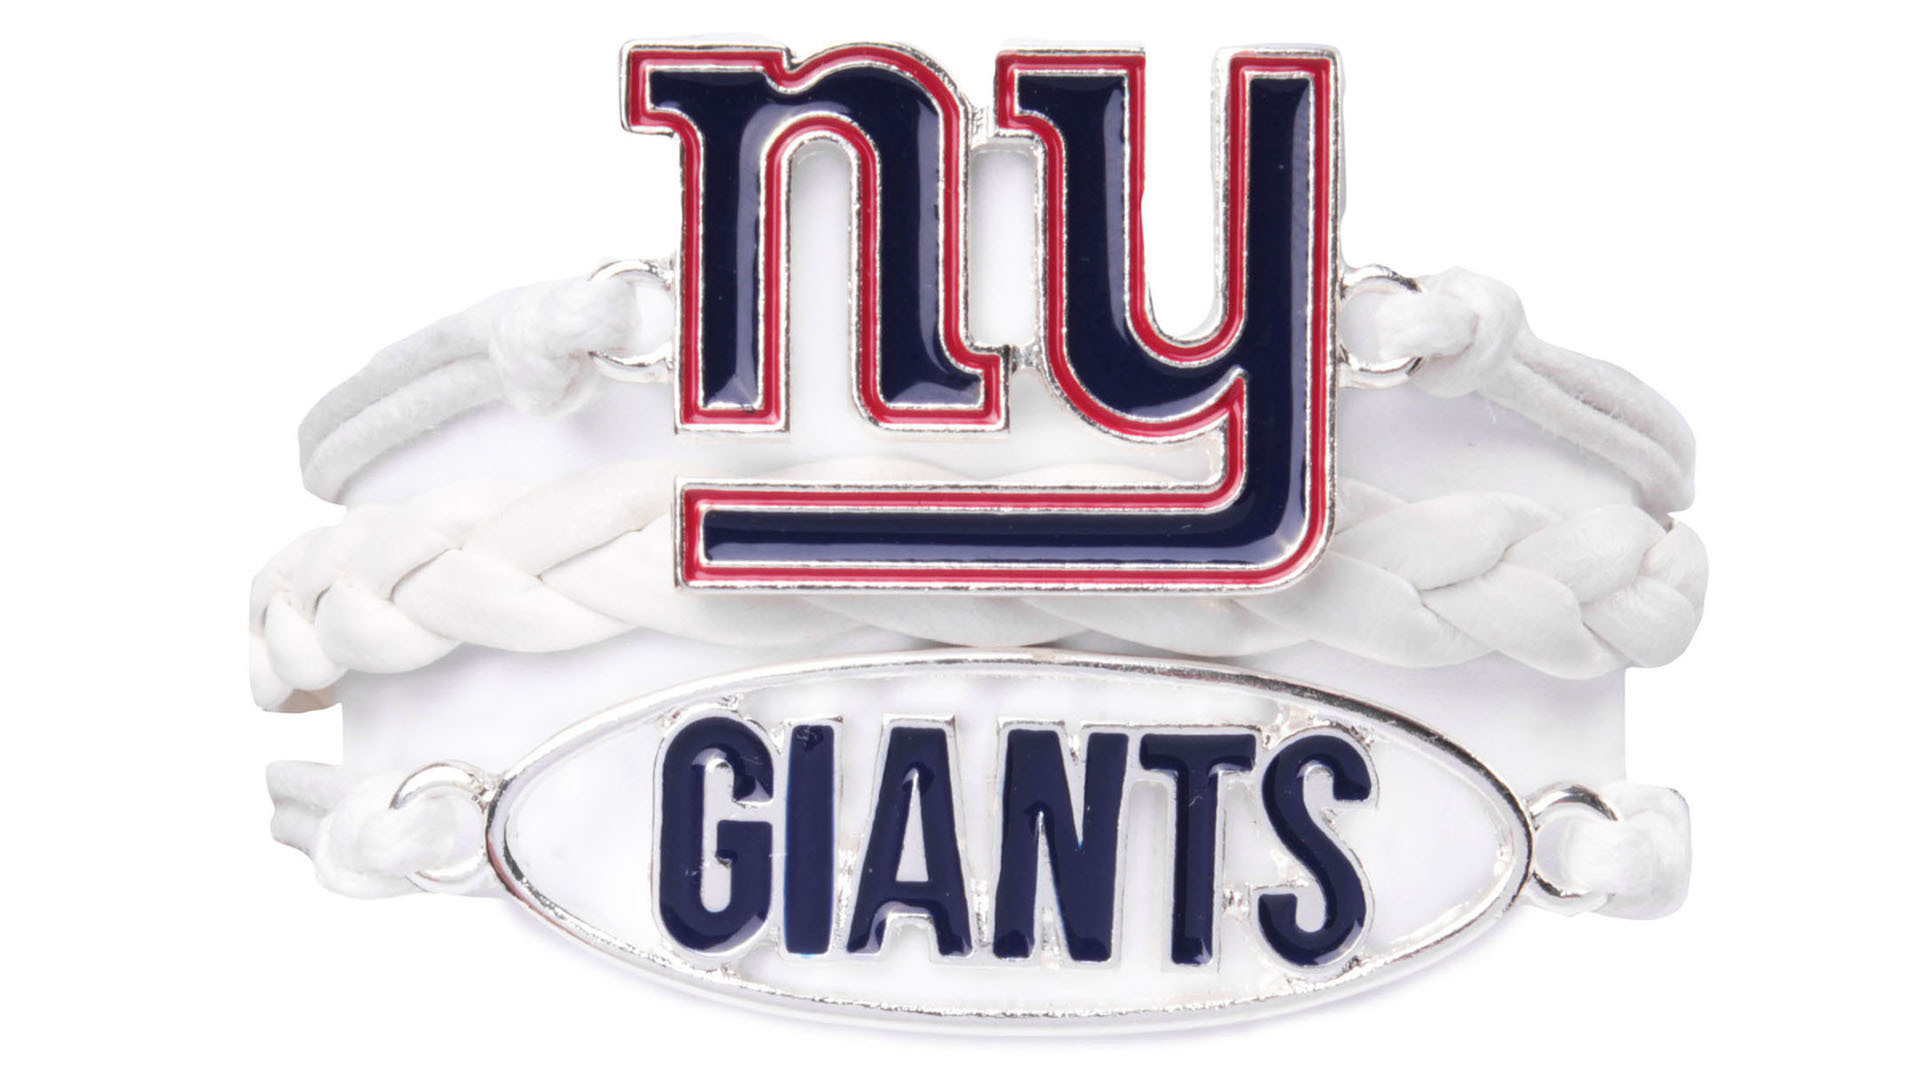 New York Giants Computer Backgrounds